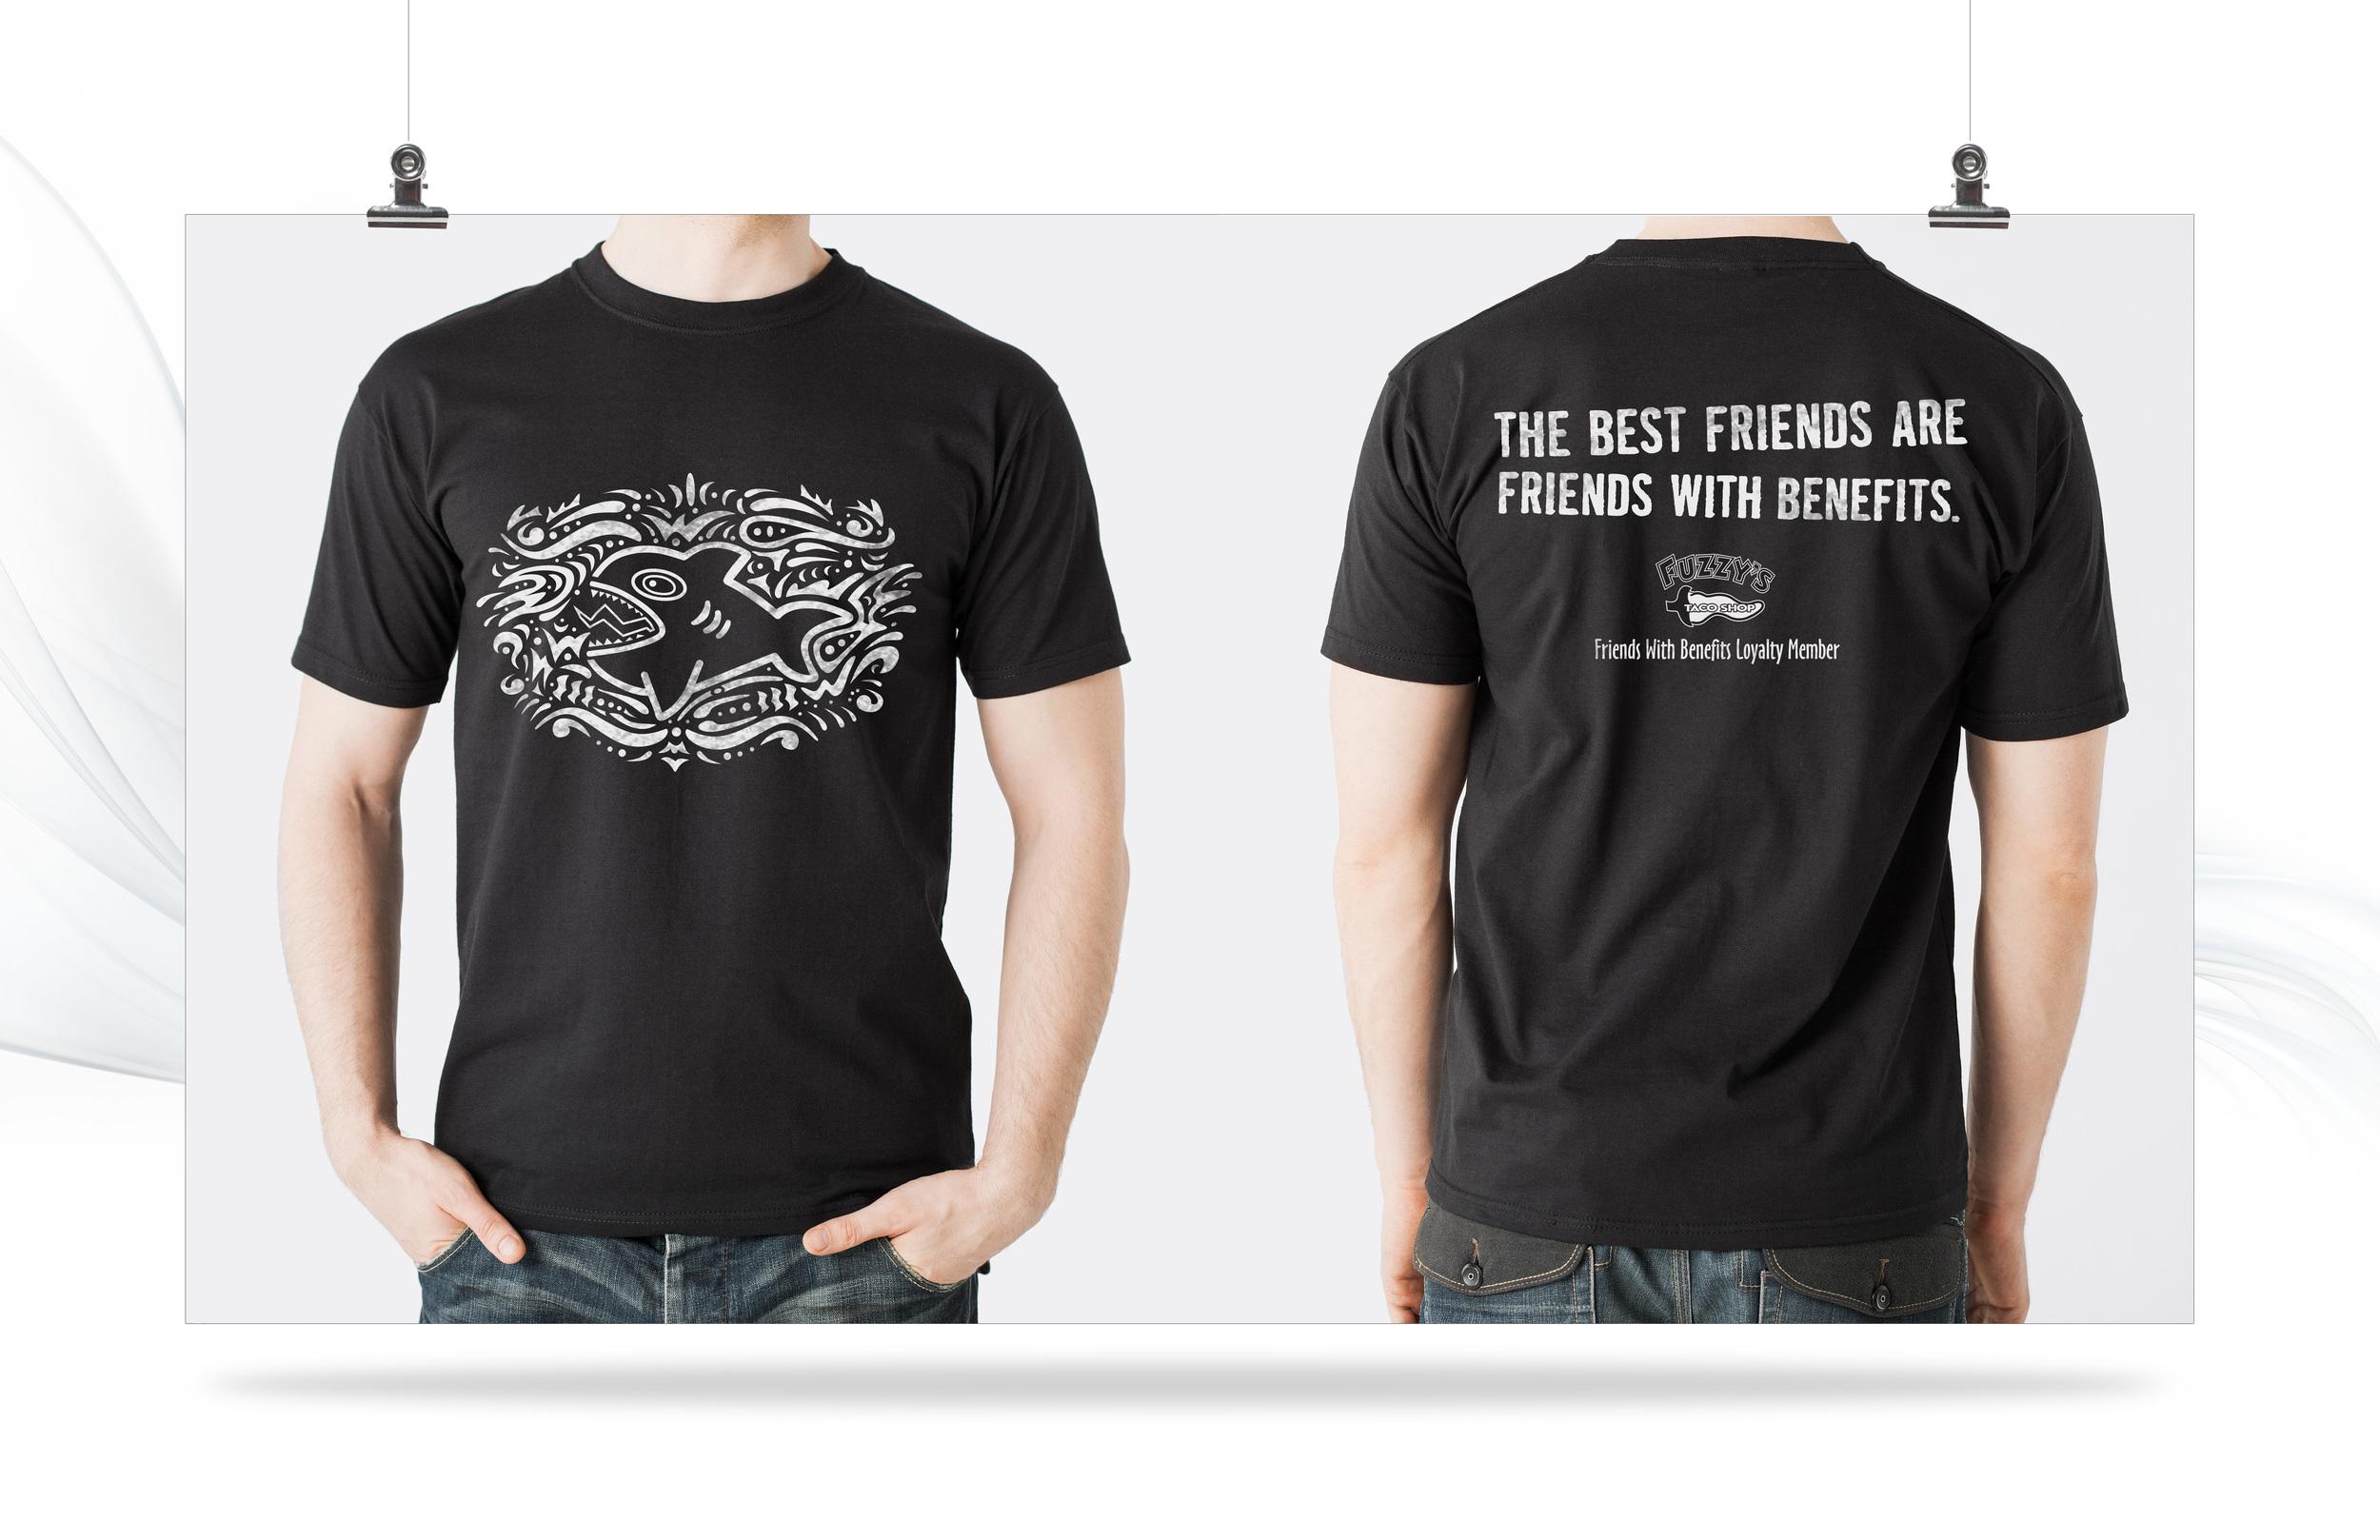 FUZ_T-Shirt_Benefits_Portfolio.jpg